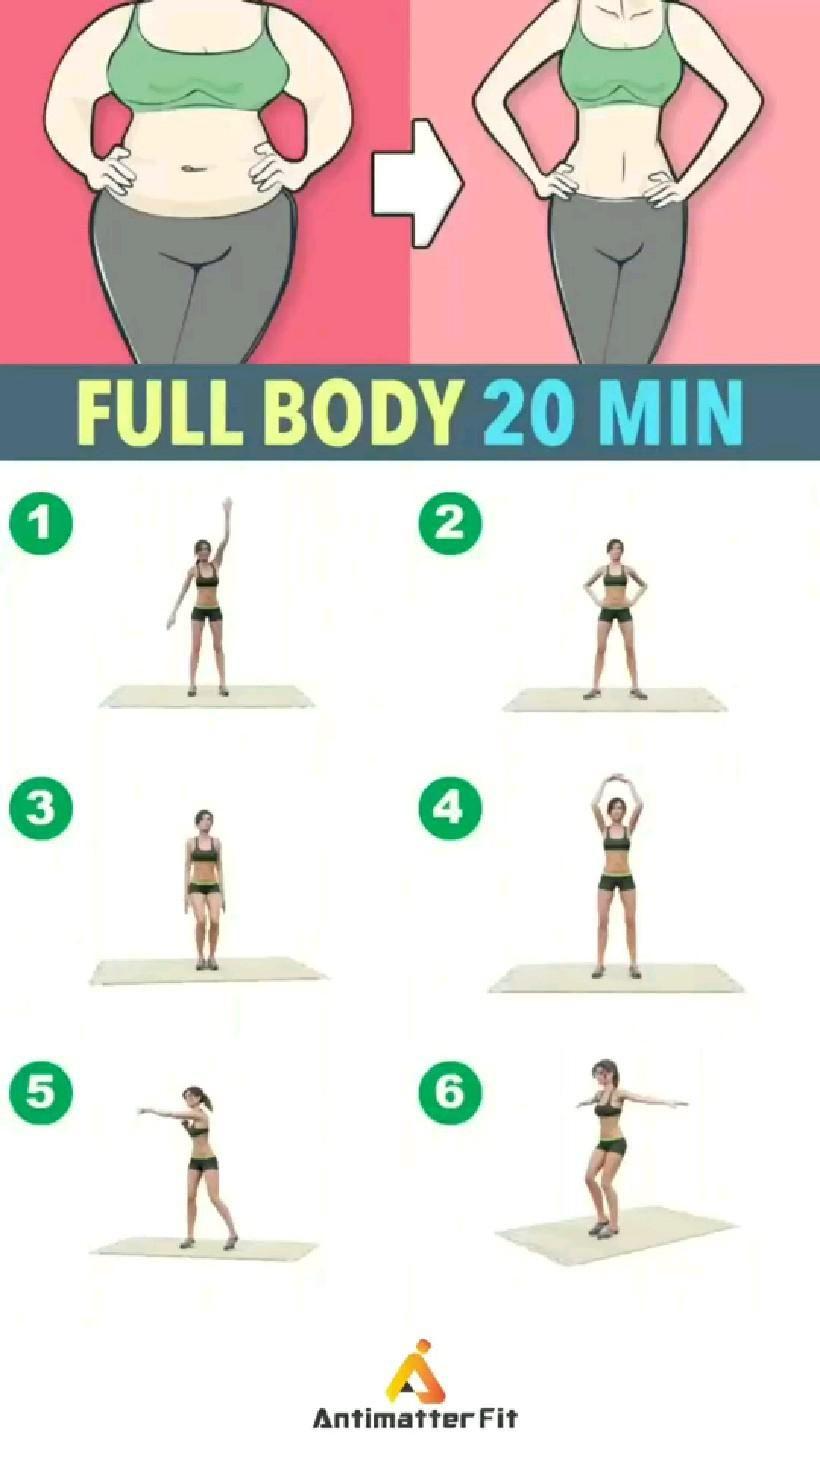 Full Body 20 Min Workout